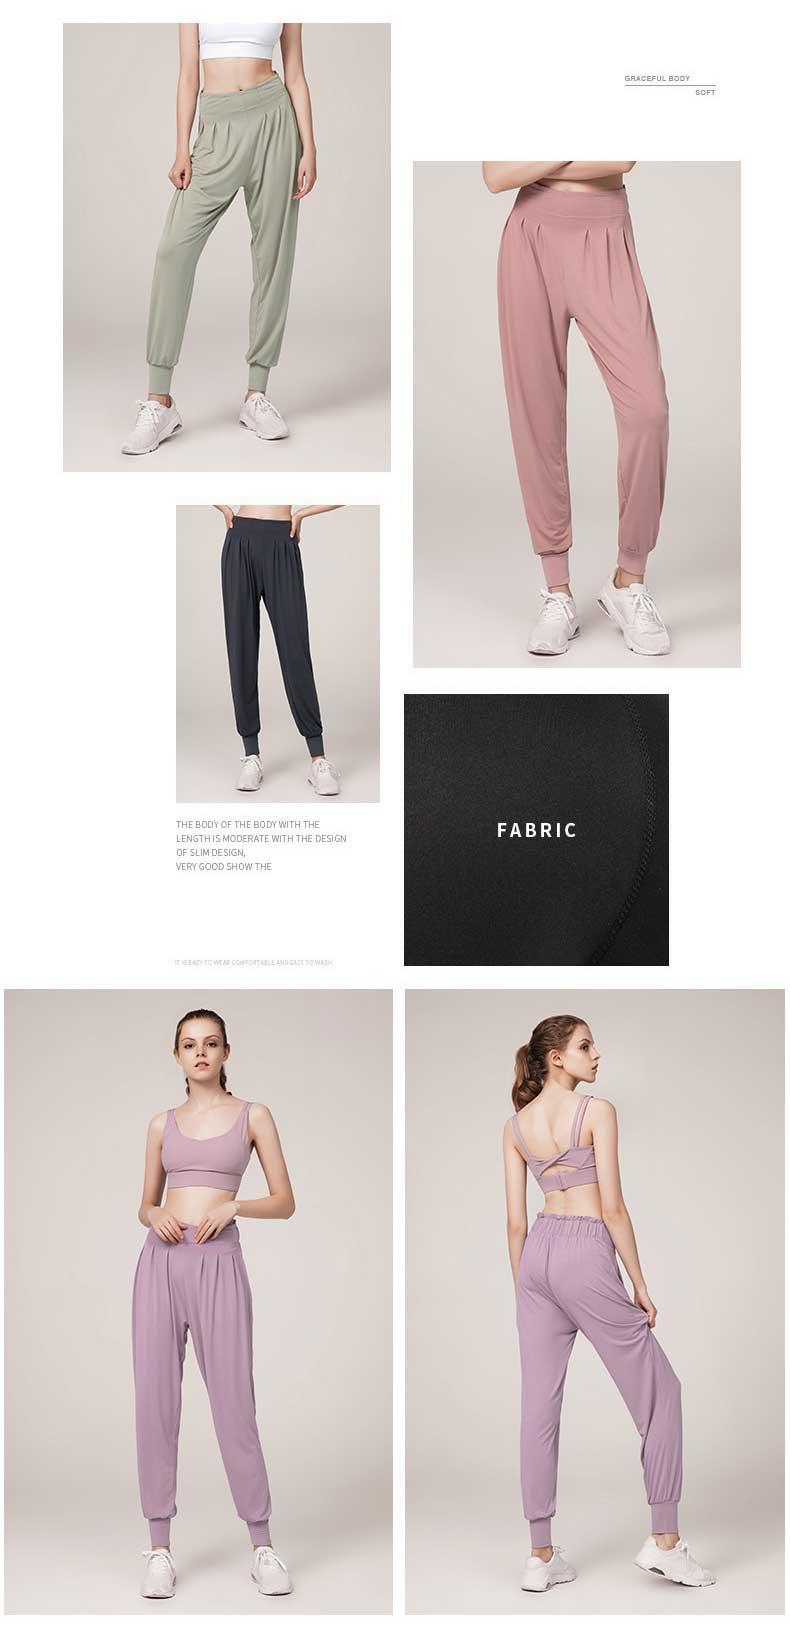 Casual-yoga-pants-light-and-soft-spun-rayon-230-grams-thin-and-no-see-through